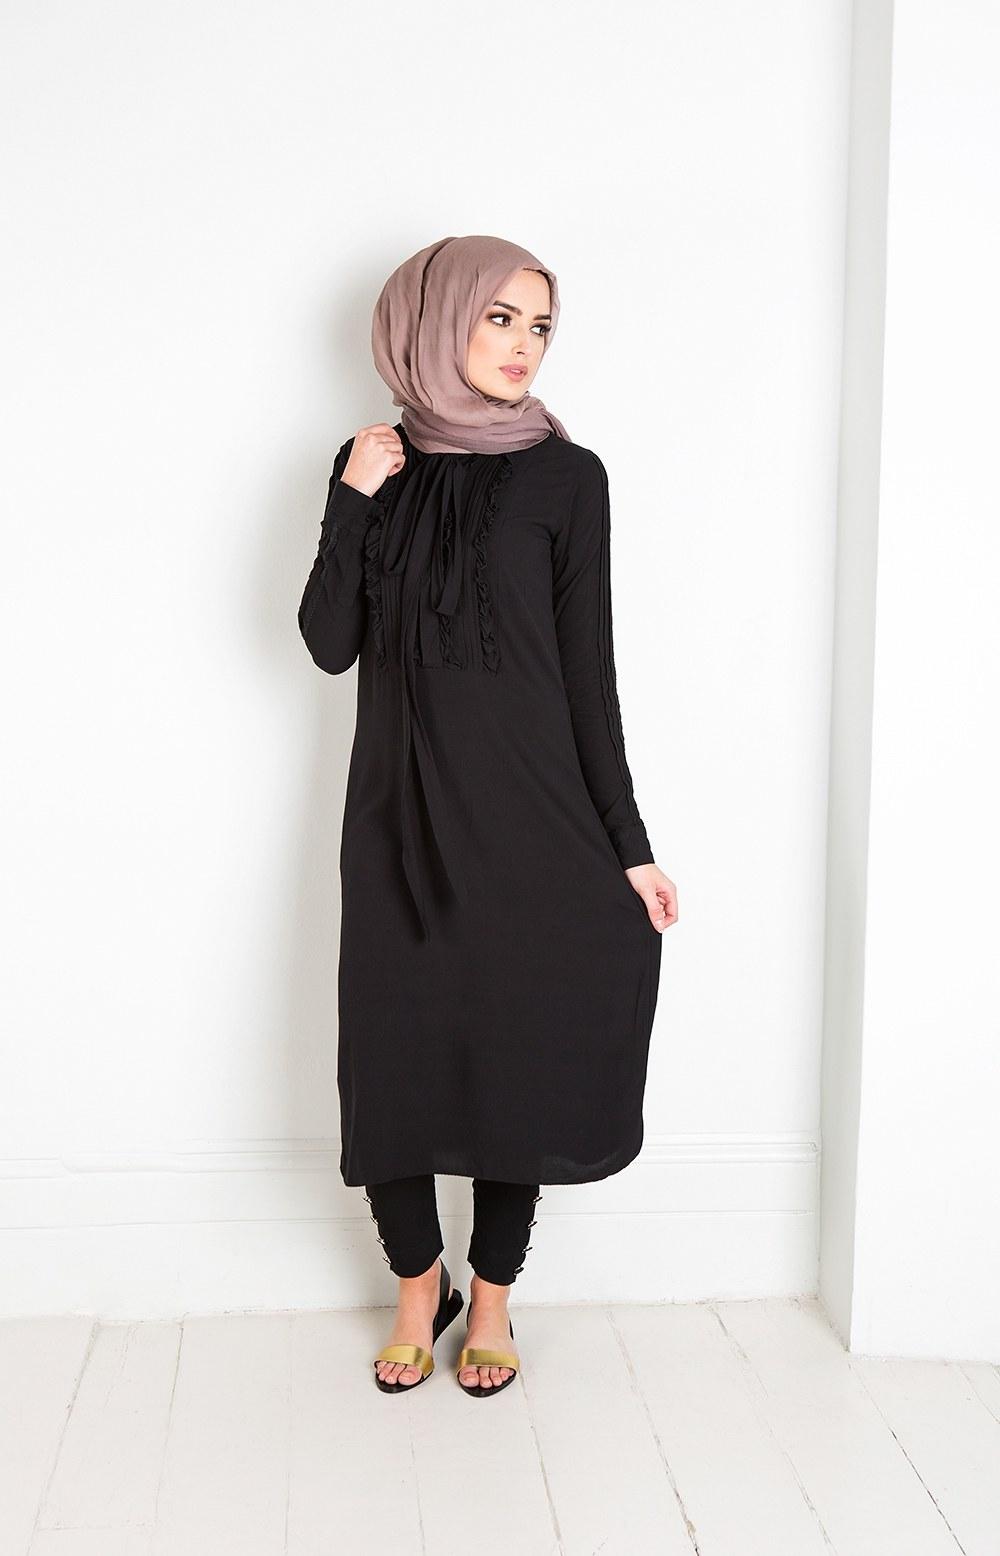 Model Baju Lebaran Simple Rldj 25 Trend Model Baju Muslim Lebaran 2018 Simple & Modis